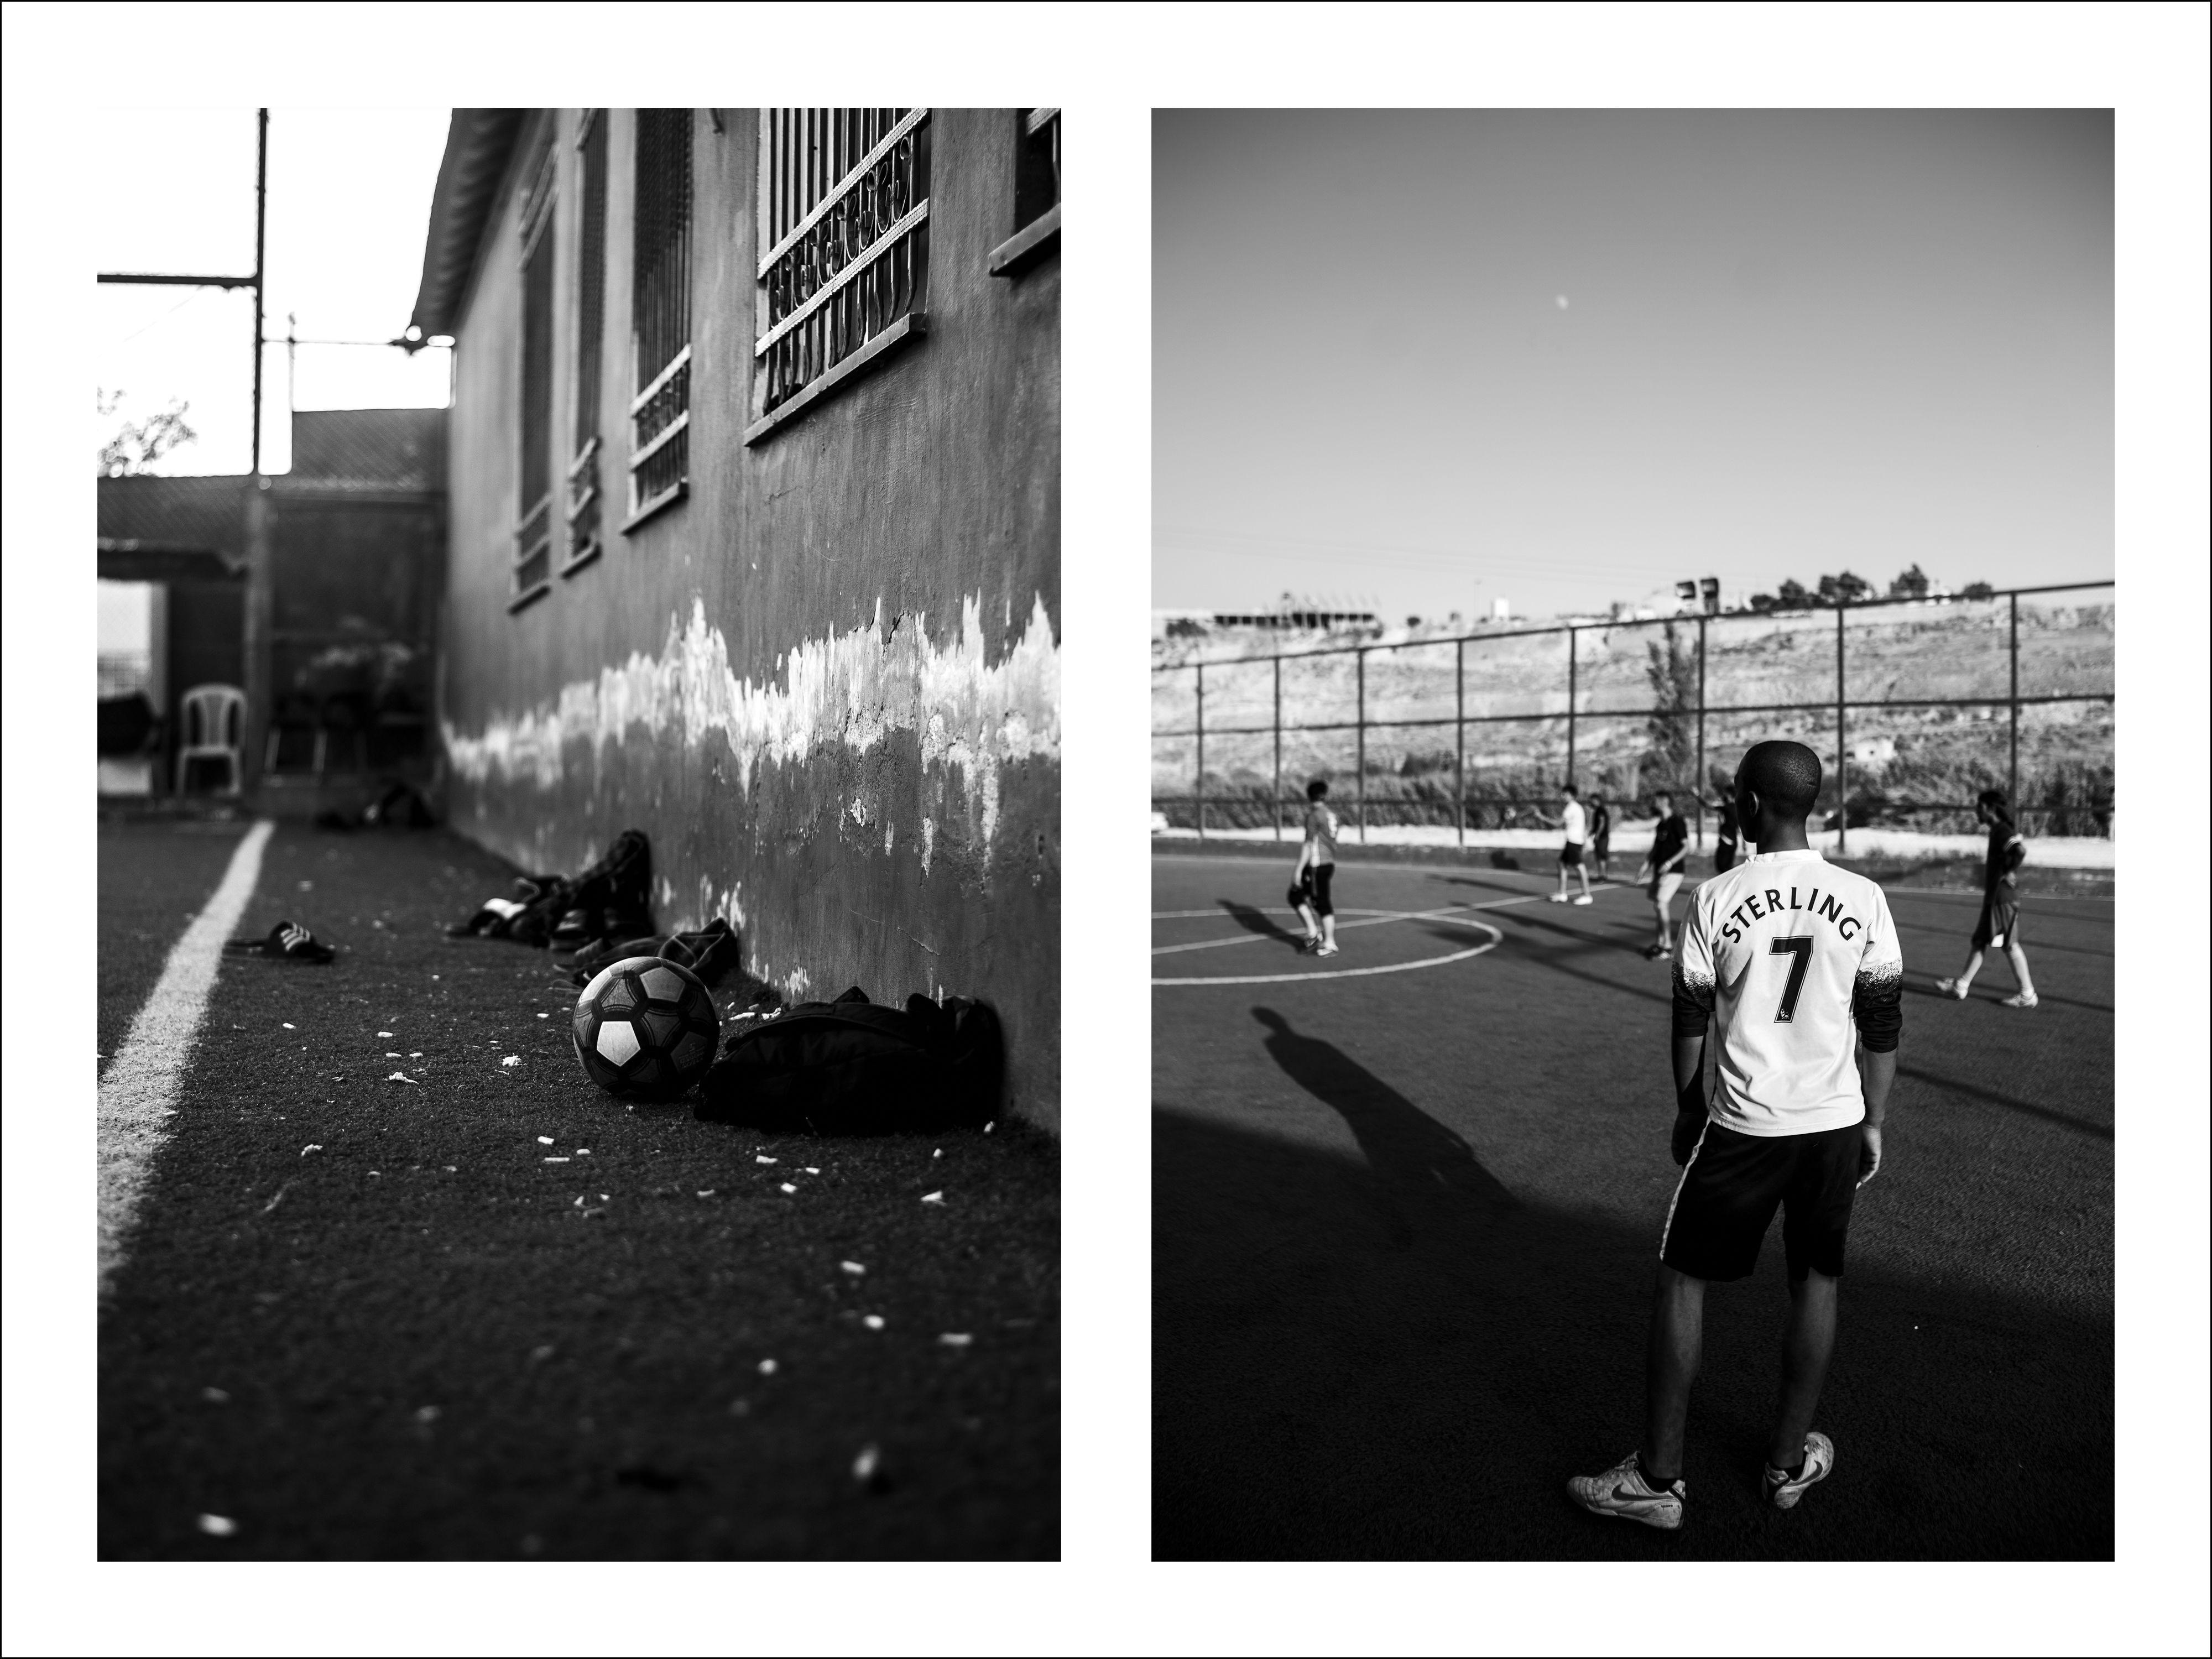 Eleonora Sabet self-portrait portrait fotografia photography reportage